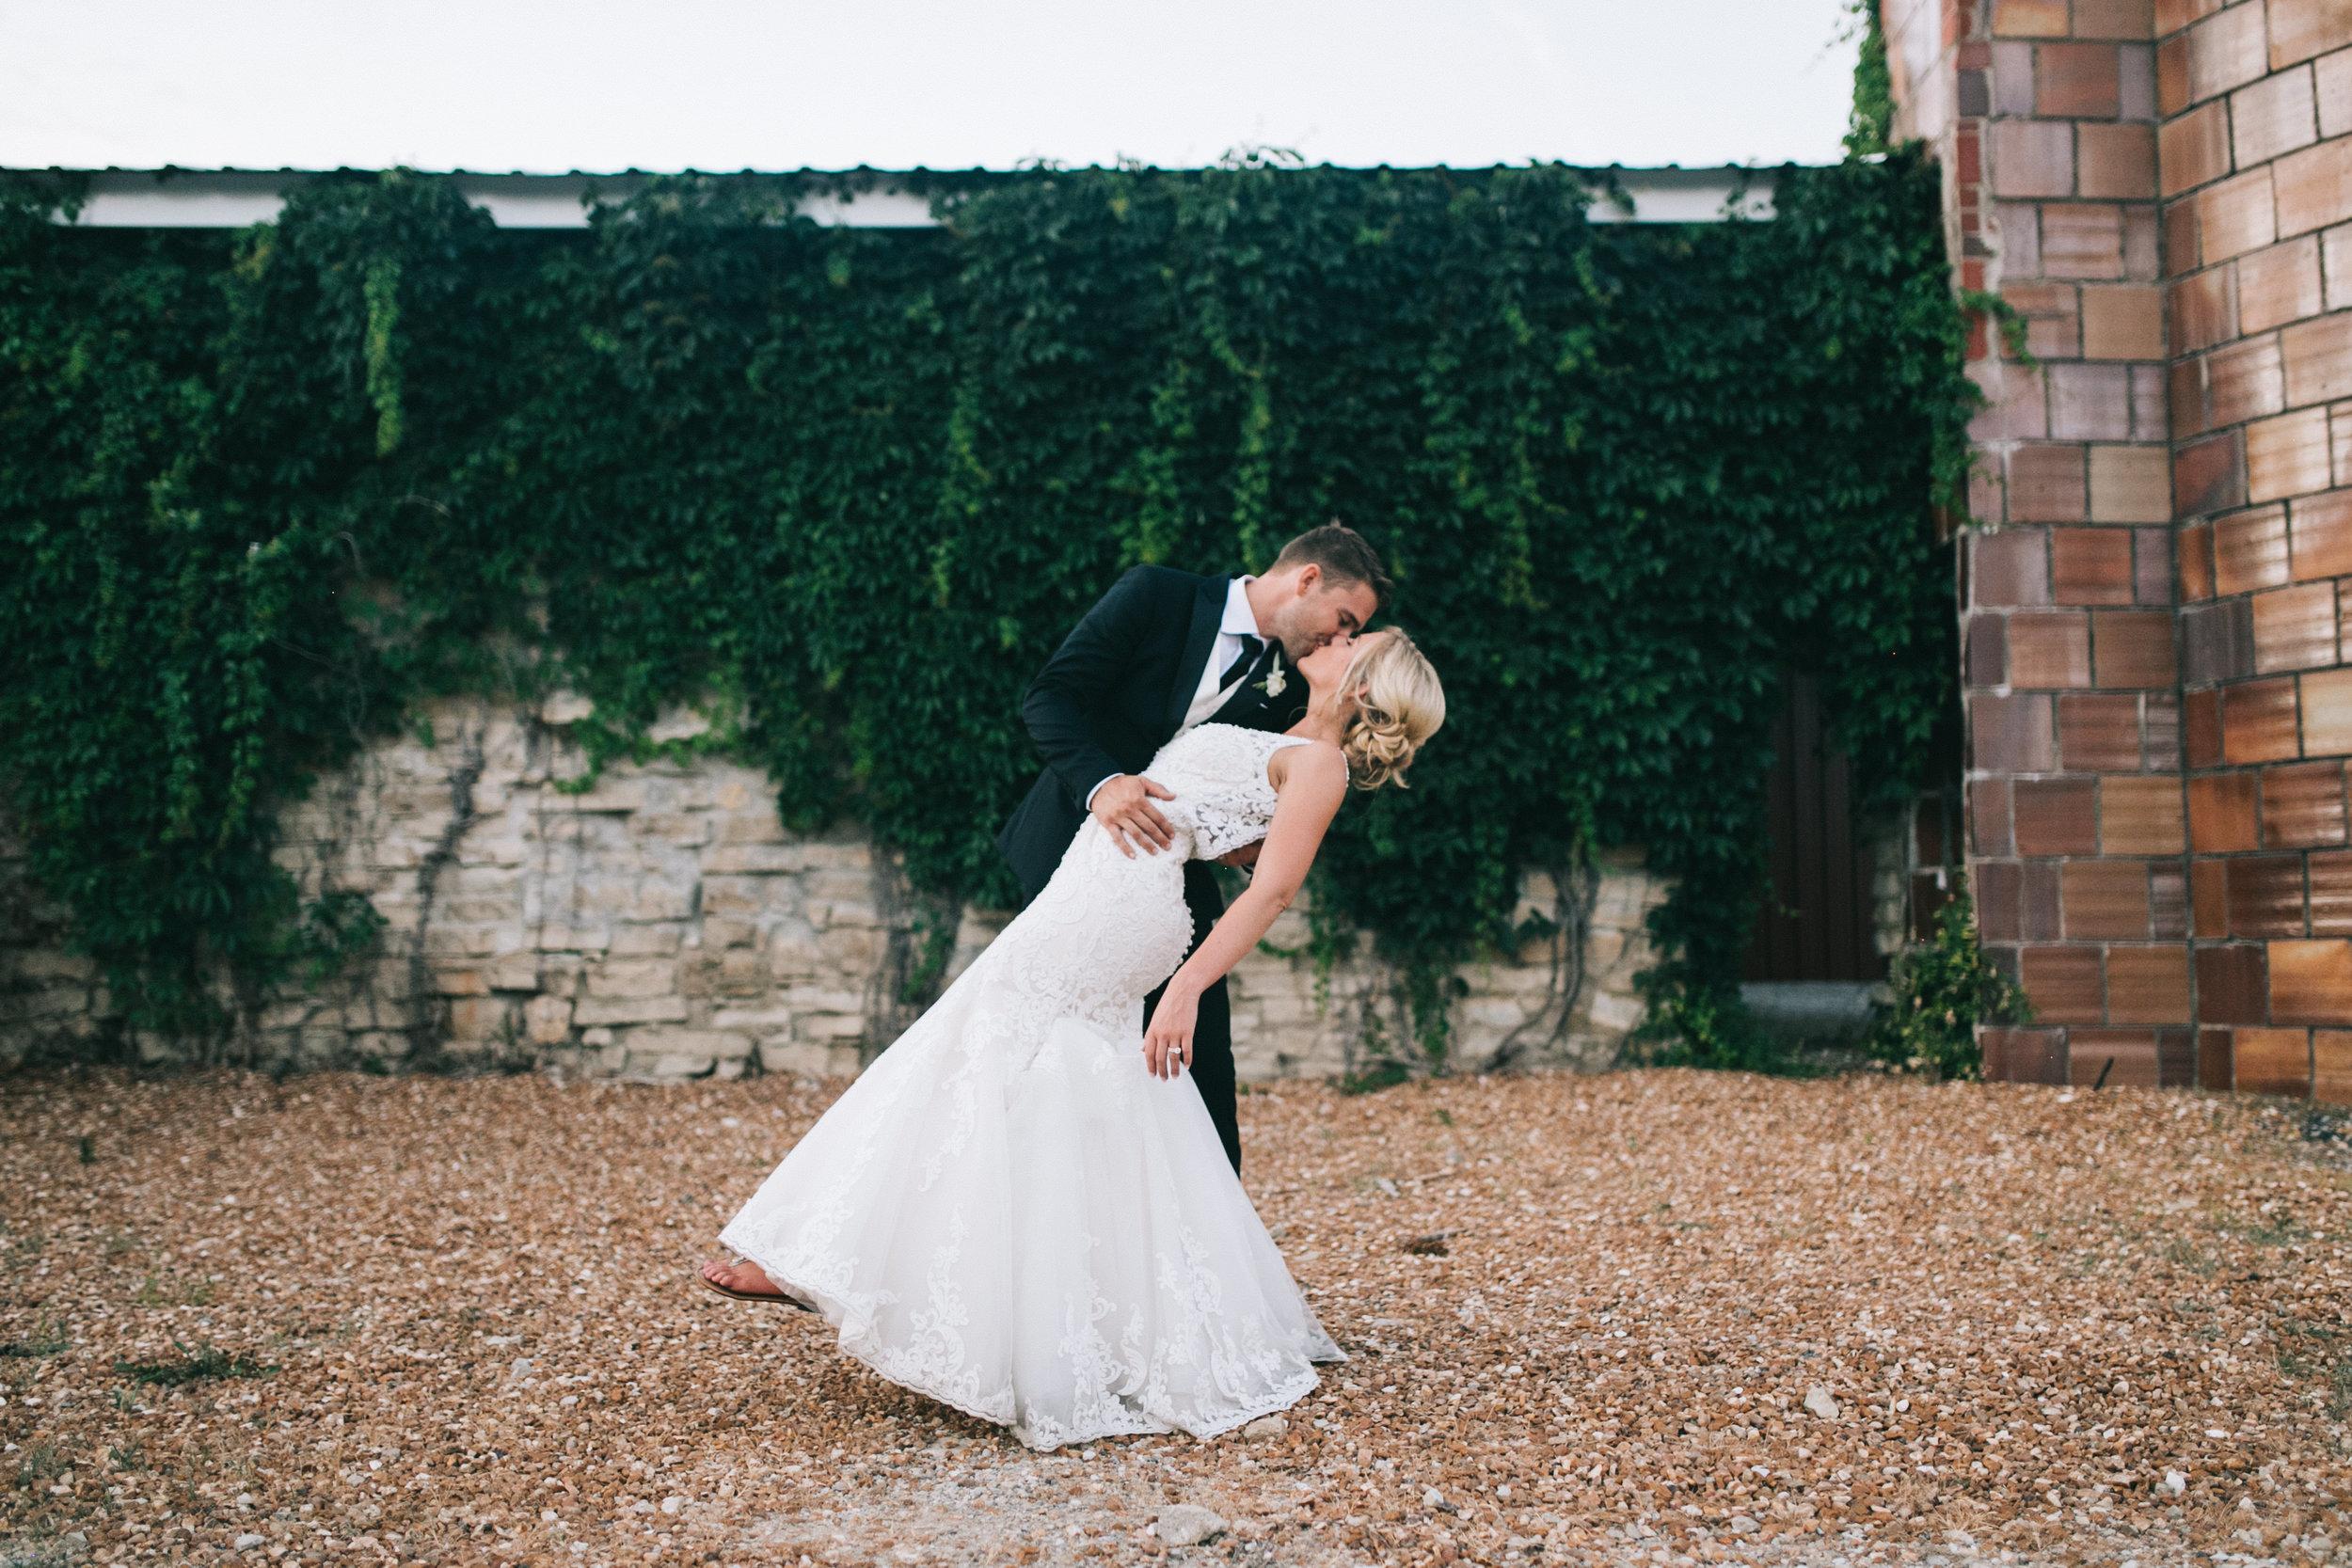 Bulger Creative Co. - St. Louis Wedding Venues - Haue Valley